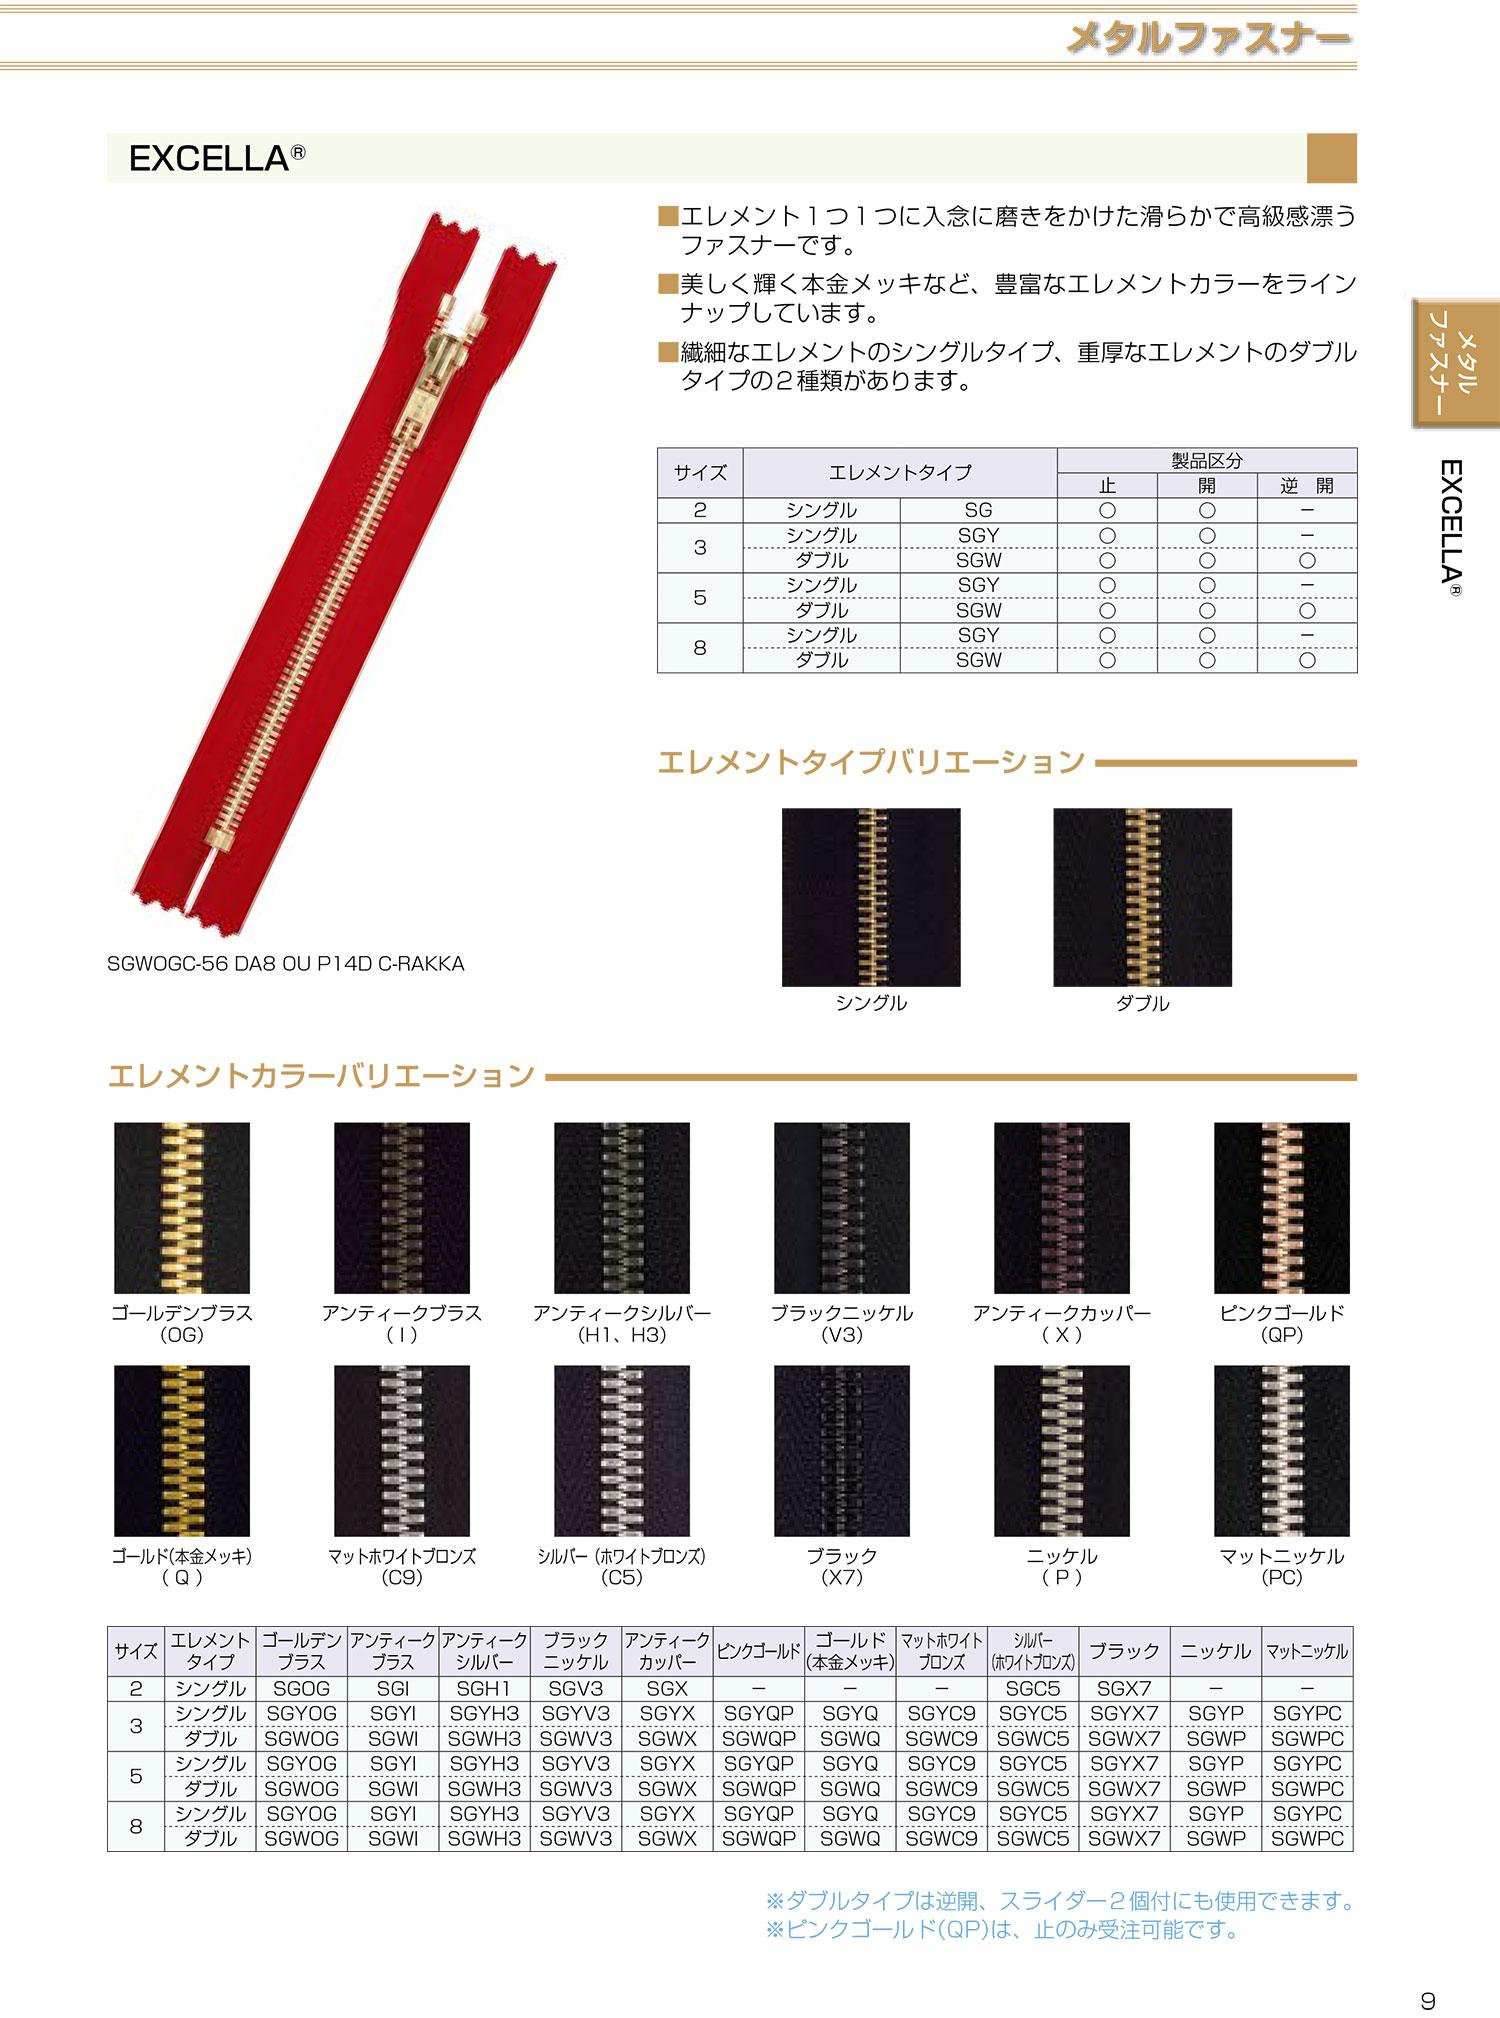 5SGYC9OR エクセラ 5サイズ マットホワイトブロンズ オープン シングル[ファスナー] YKK/オークラ商事 - ApparelX アパレル資材卸通販